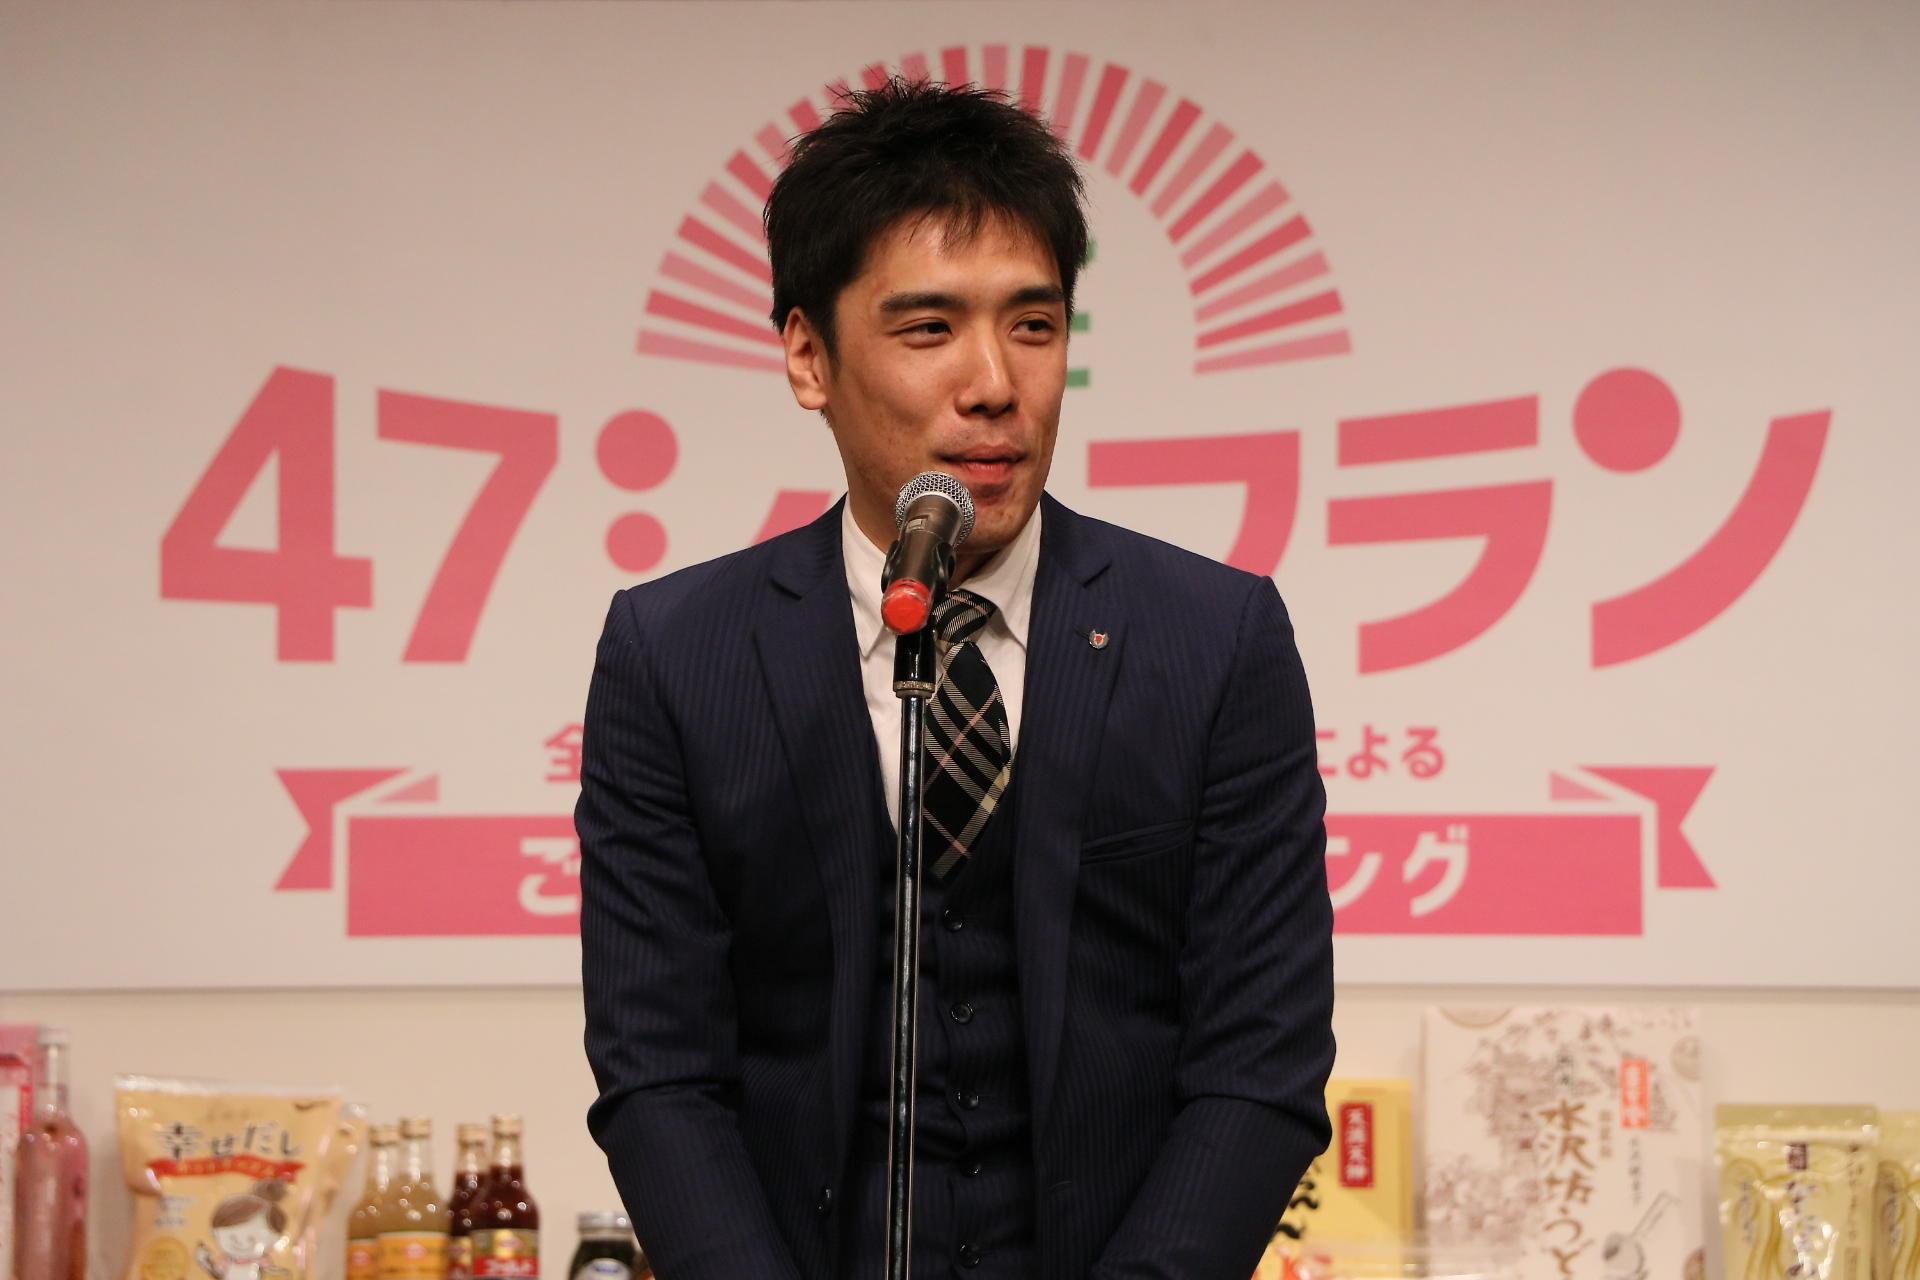 http://news.yoshimoto.co.jp/20180313171008-af4a3de21f860a27cf17b375931083199fbcd2a9.jpg